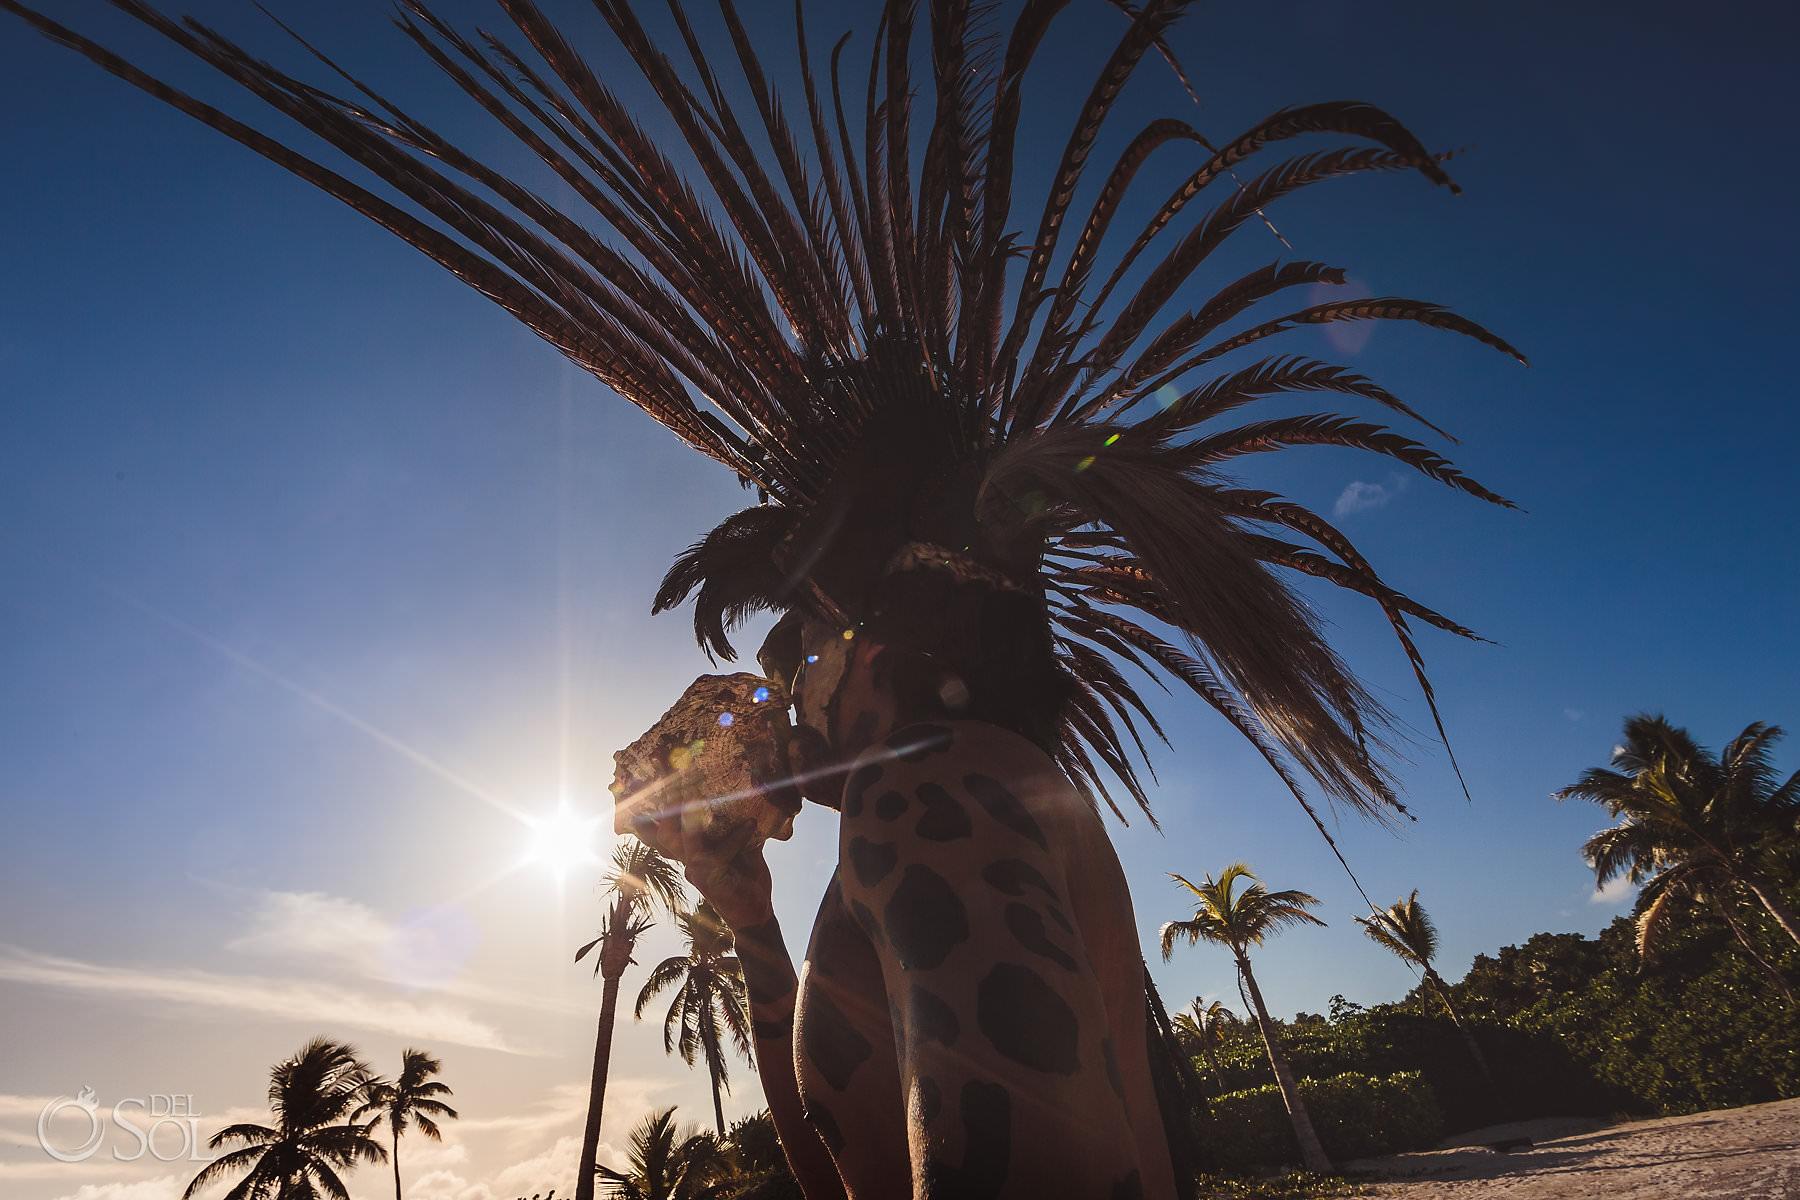 Dreams Tulum Mayan Wedding Charcoal Sound feathers shaman costume